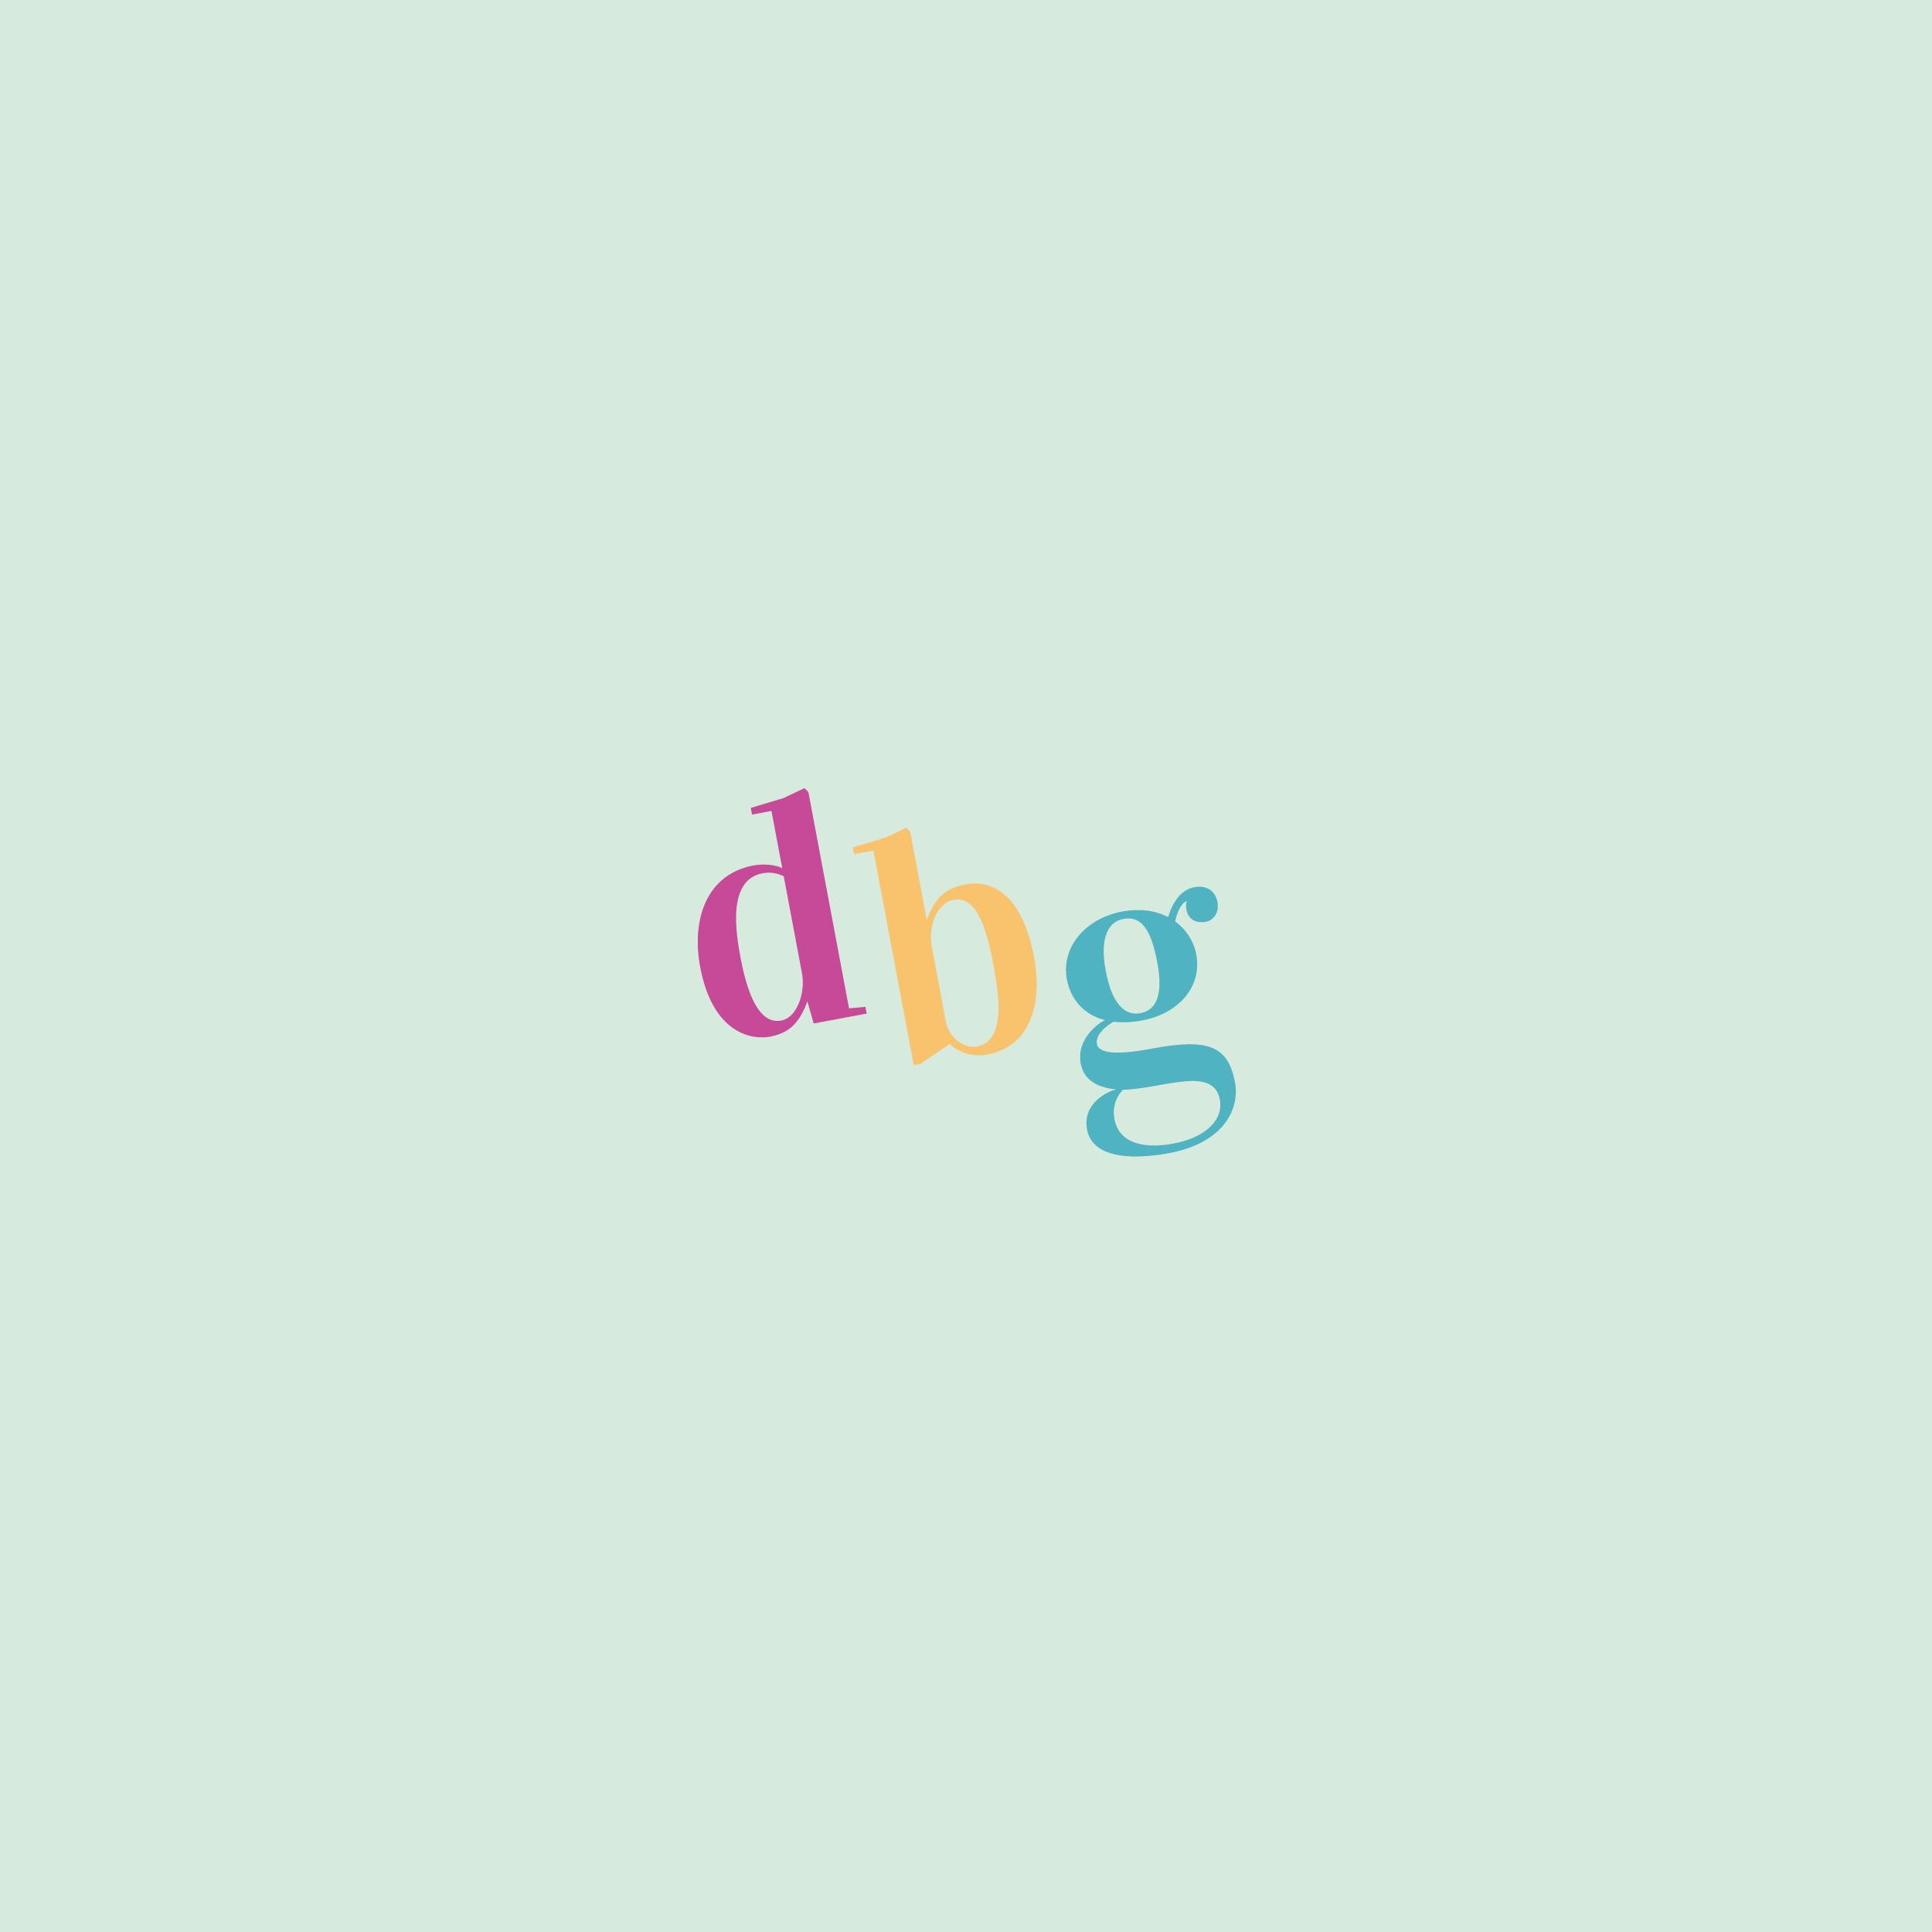 dbg update-01.png